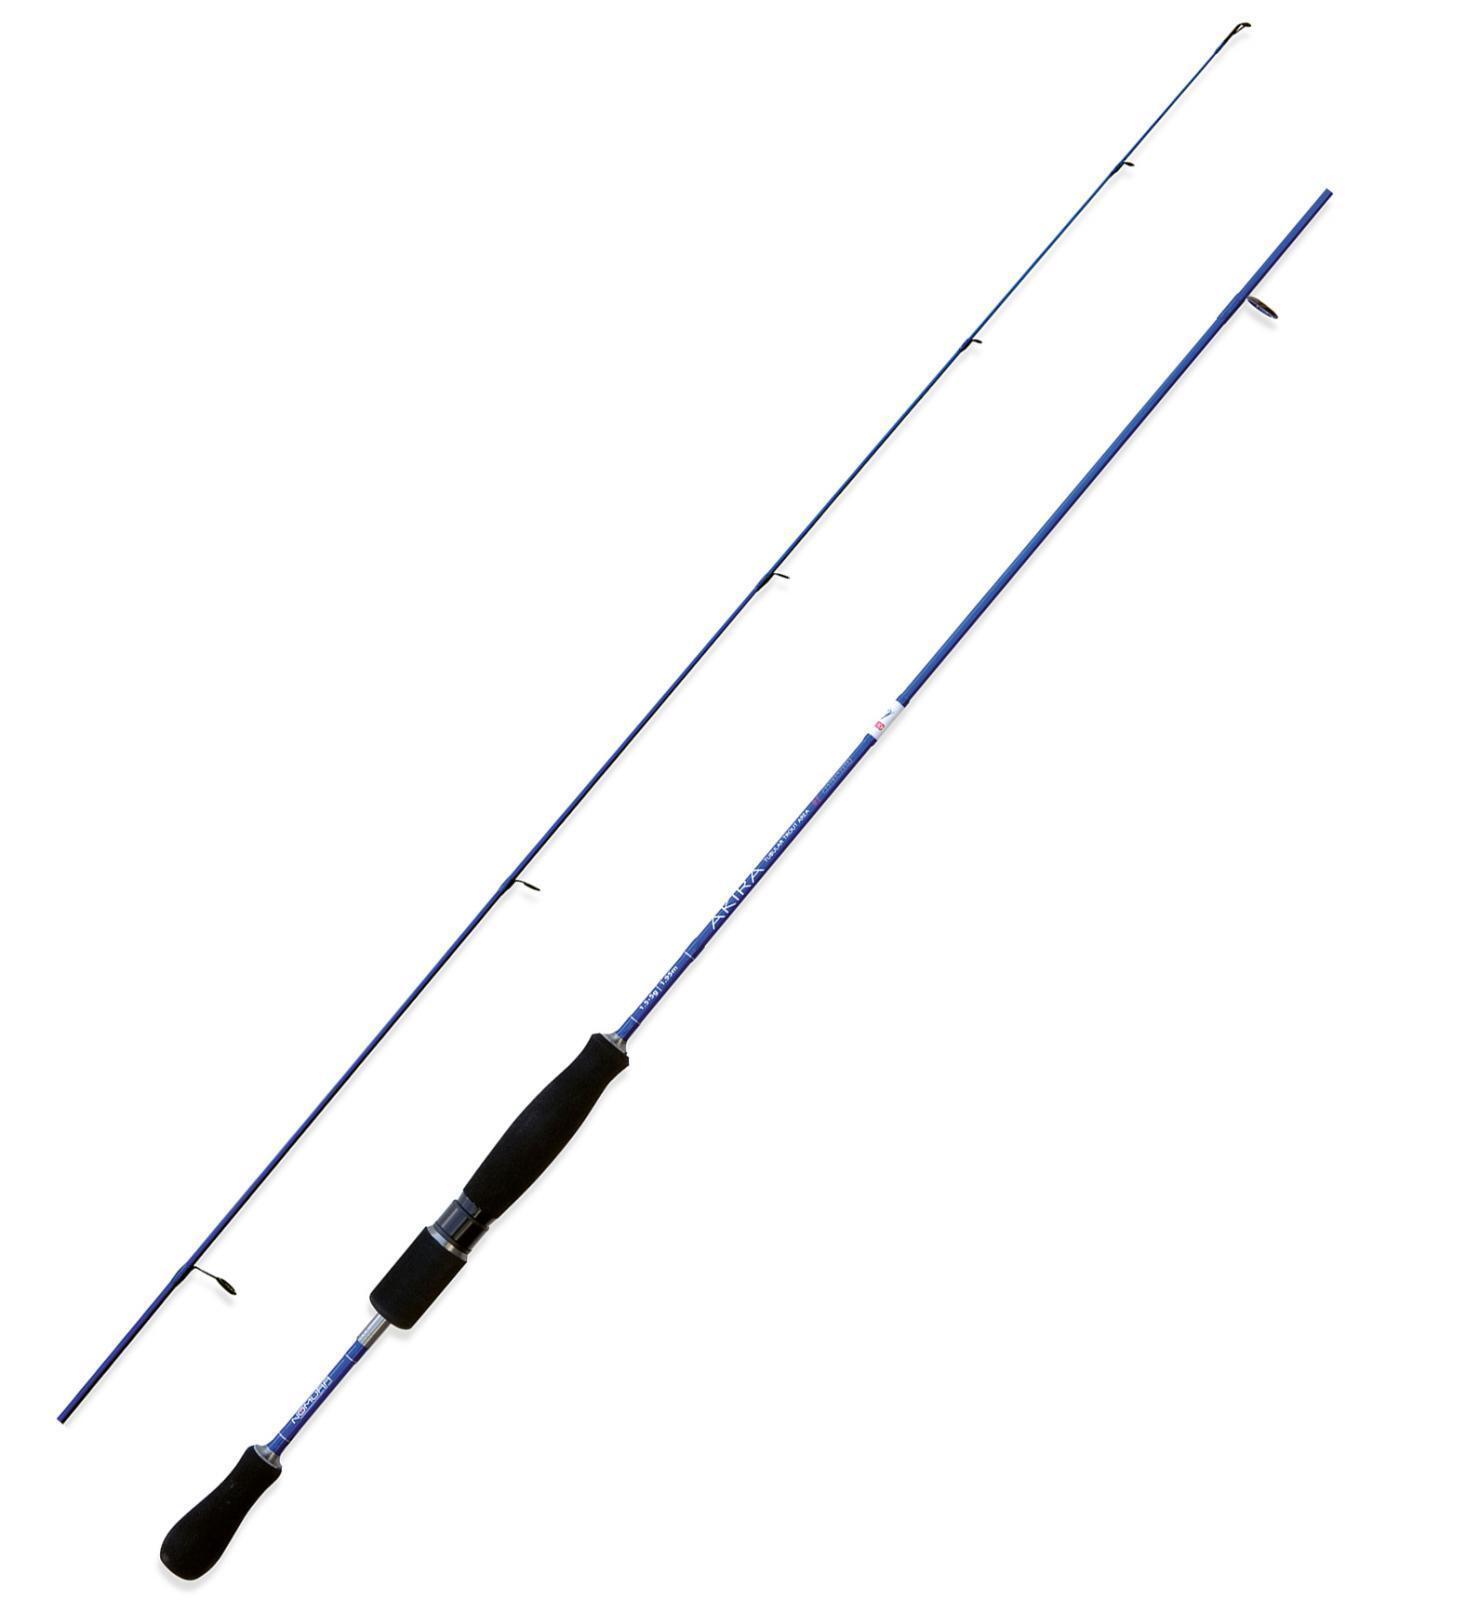 NM20540317 Nomura Canna pesca Trout Area Akira tubolar 1,76 0,5-3.5gr       CAS